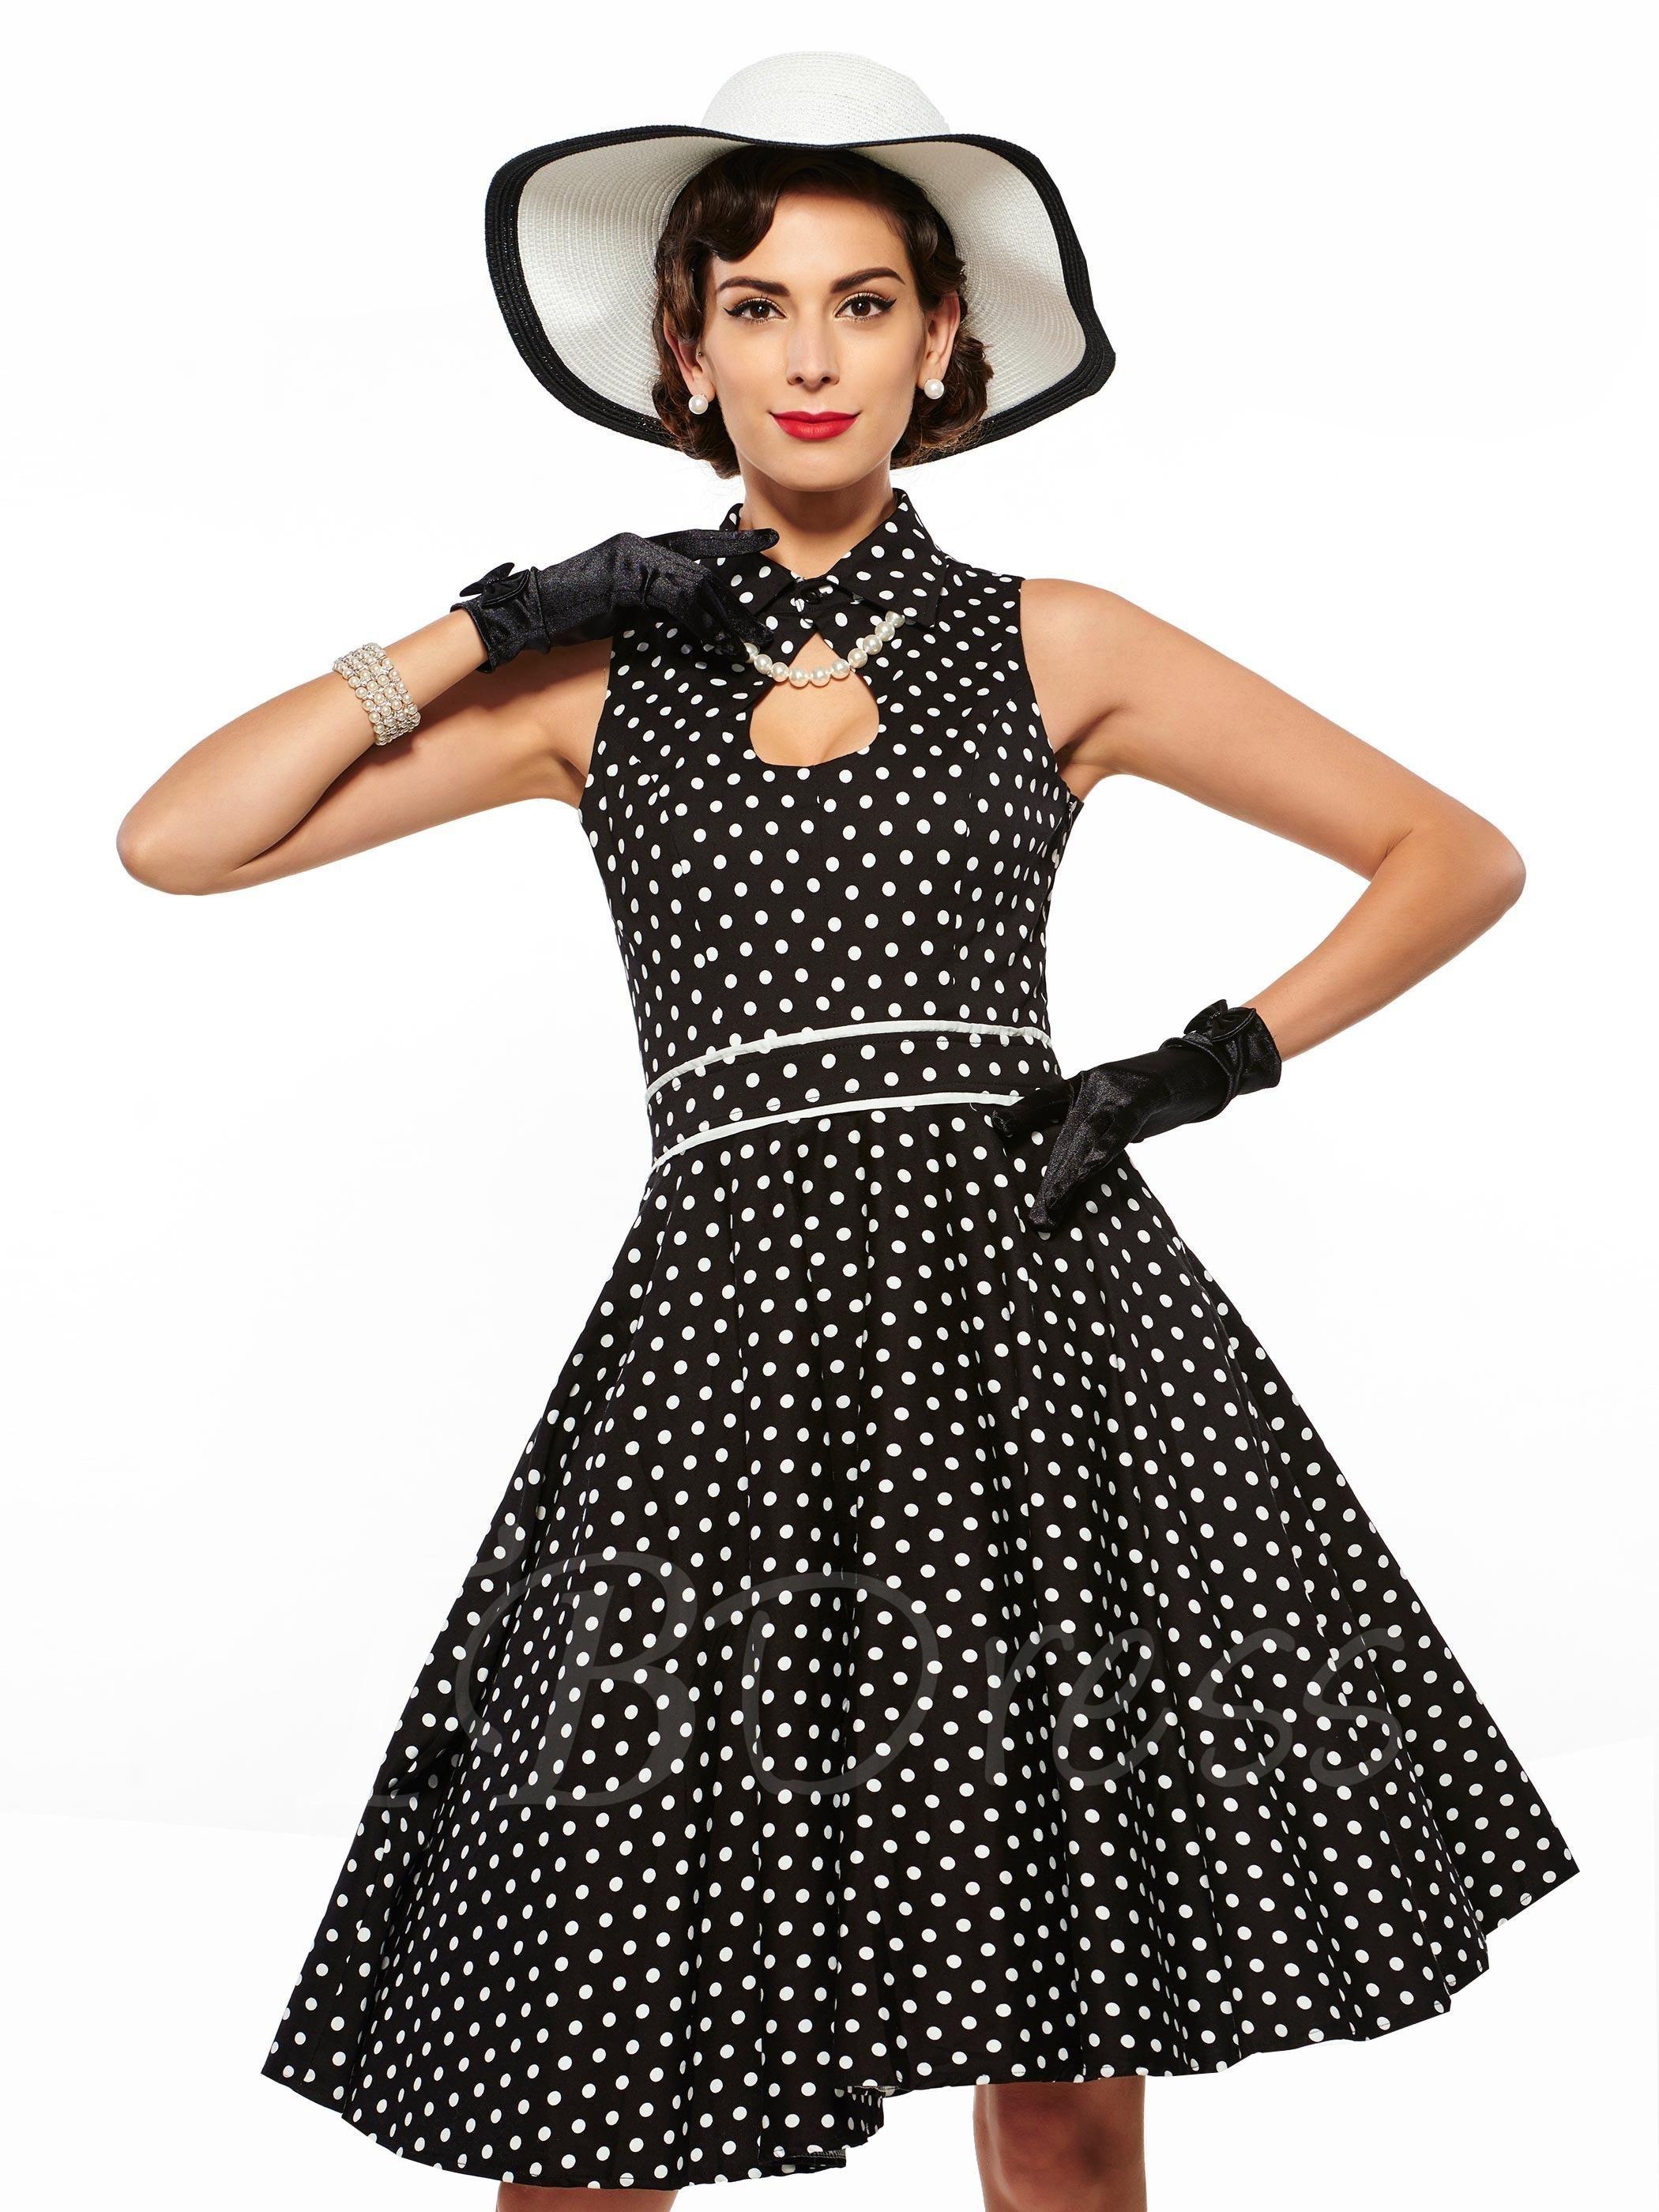 AdoreWe - TBDress Hollow Lapel Polka Dots Womens Day Dress (Plus Size Available) - AdoreWe.com